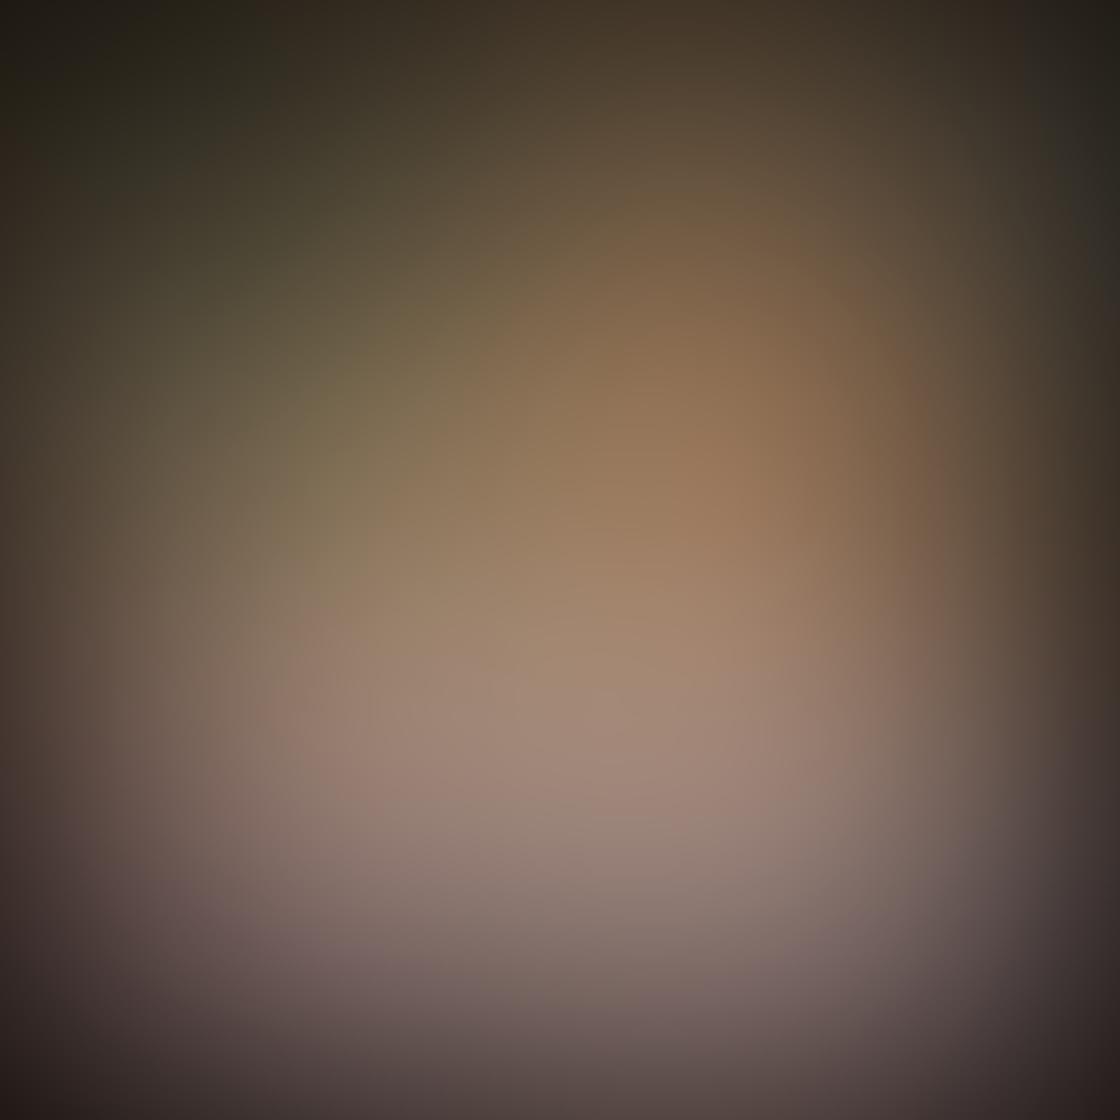 iPhone Angle Photo 19